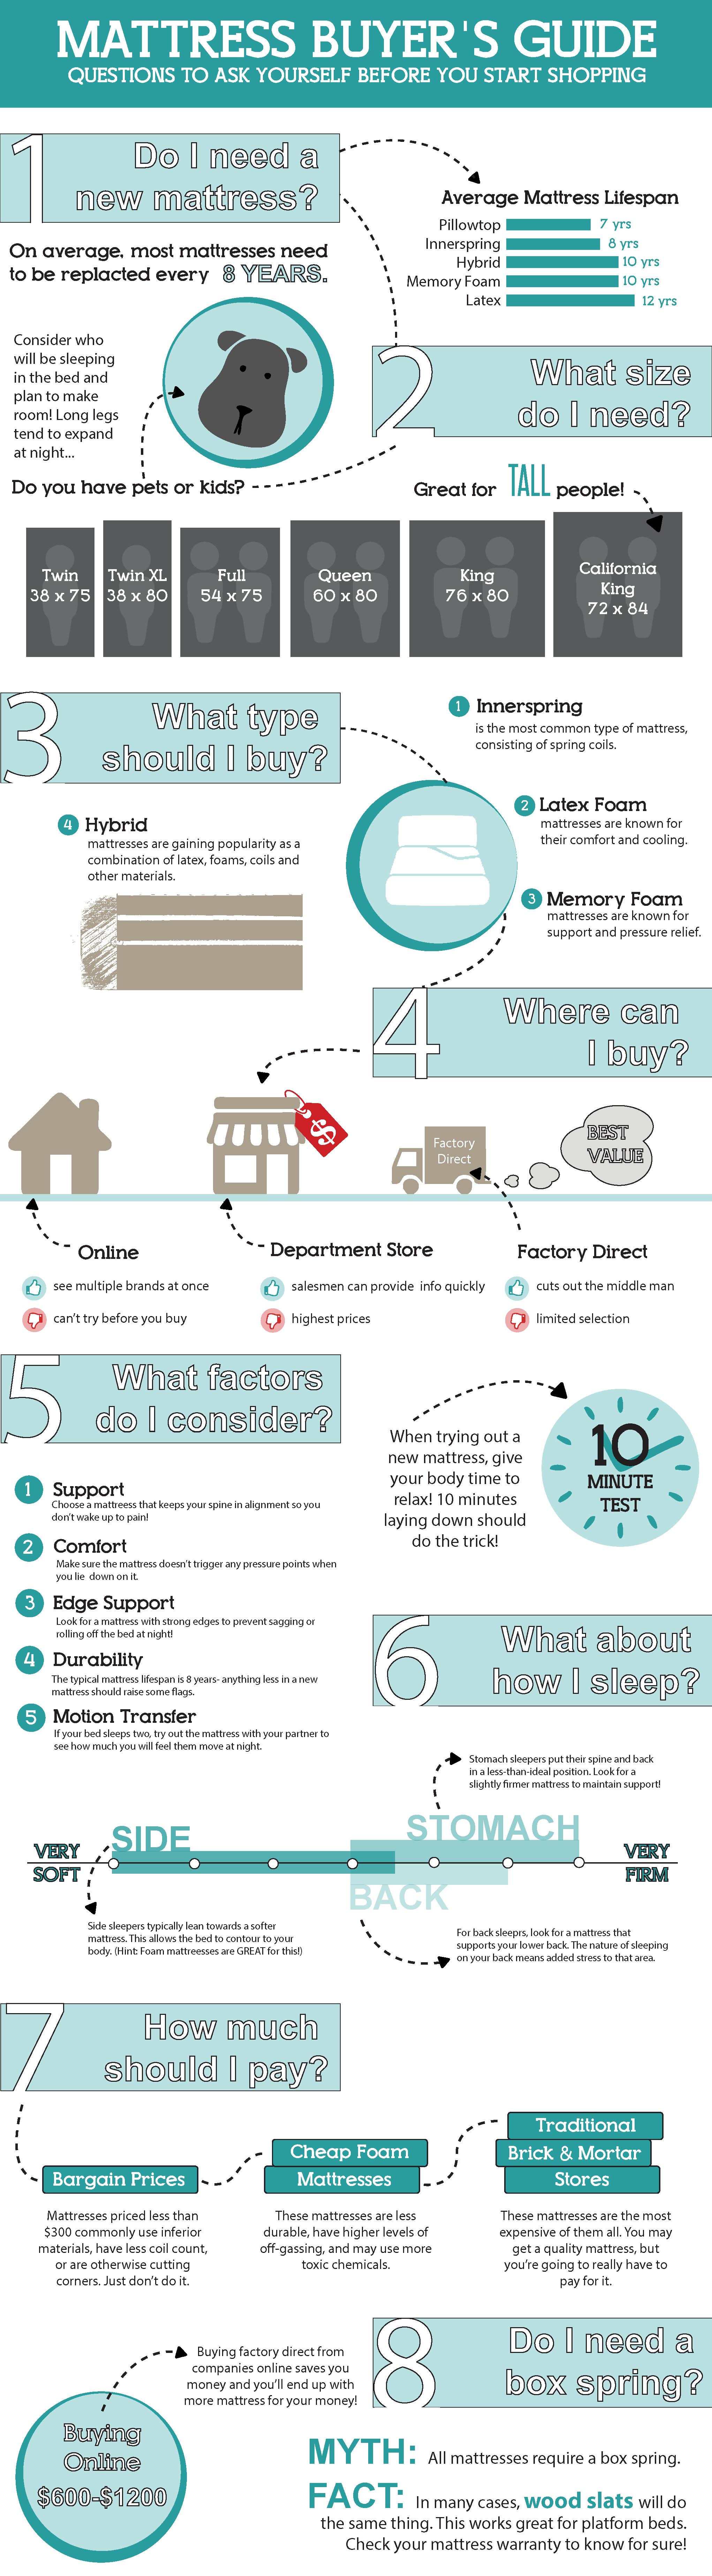 Mattress buying guide sleepopolis for When to buy a mattress